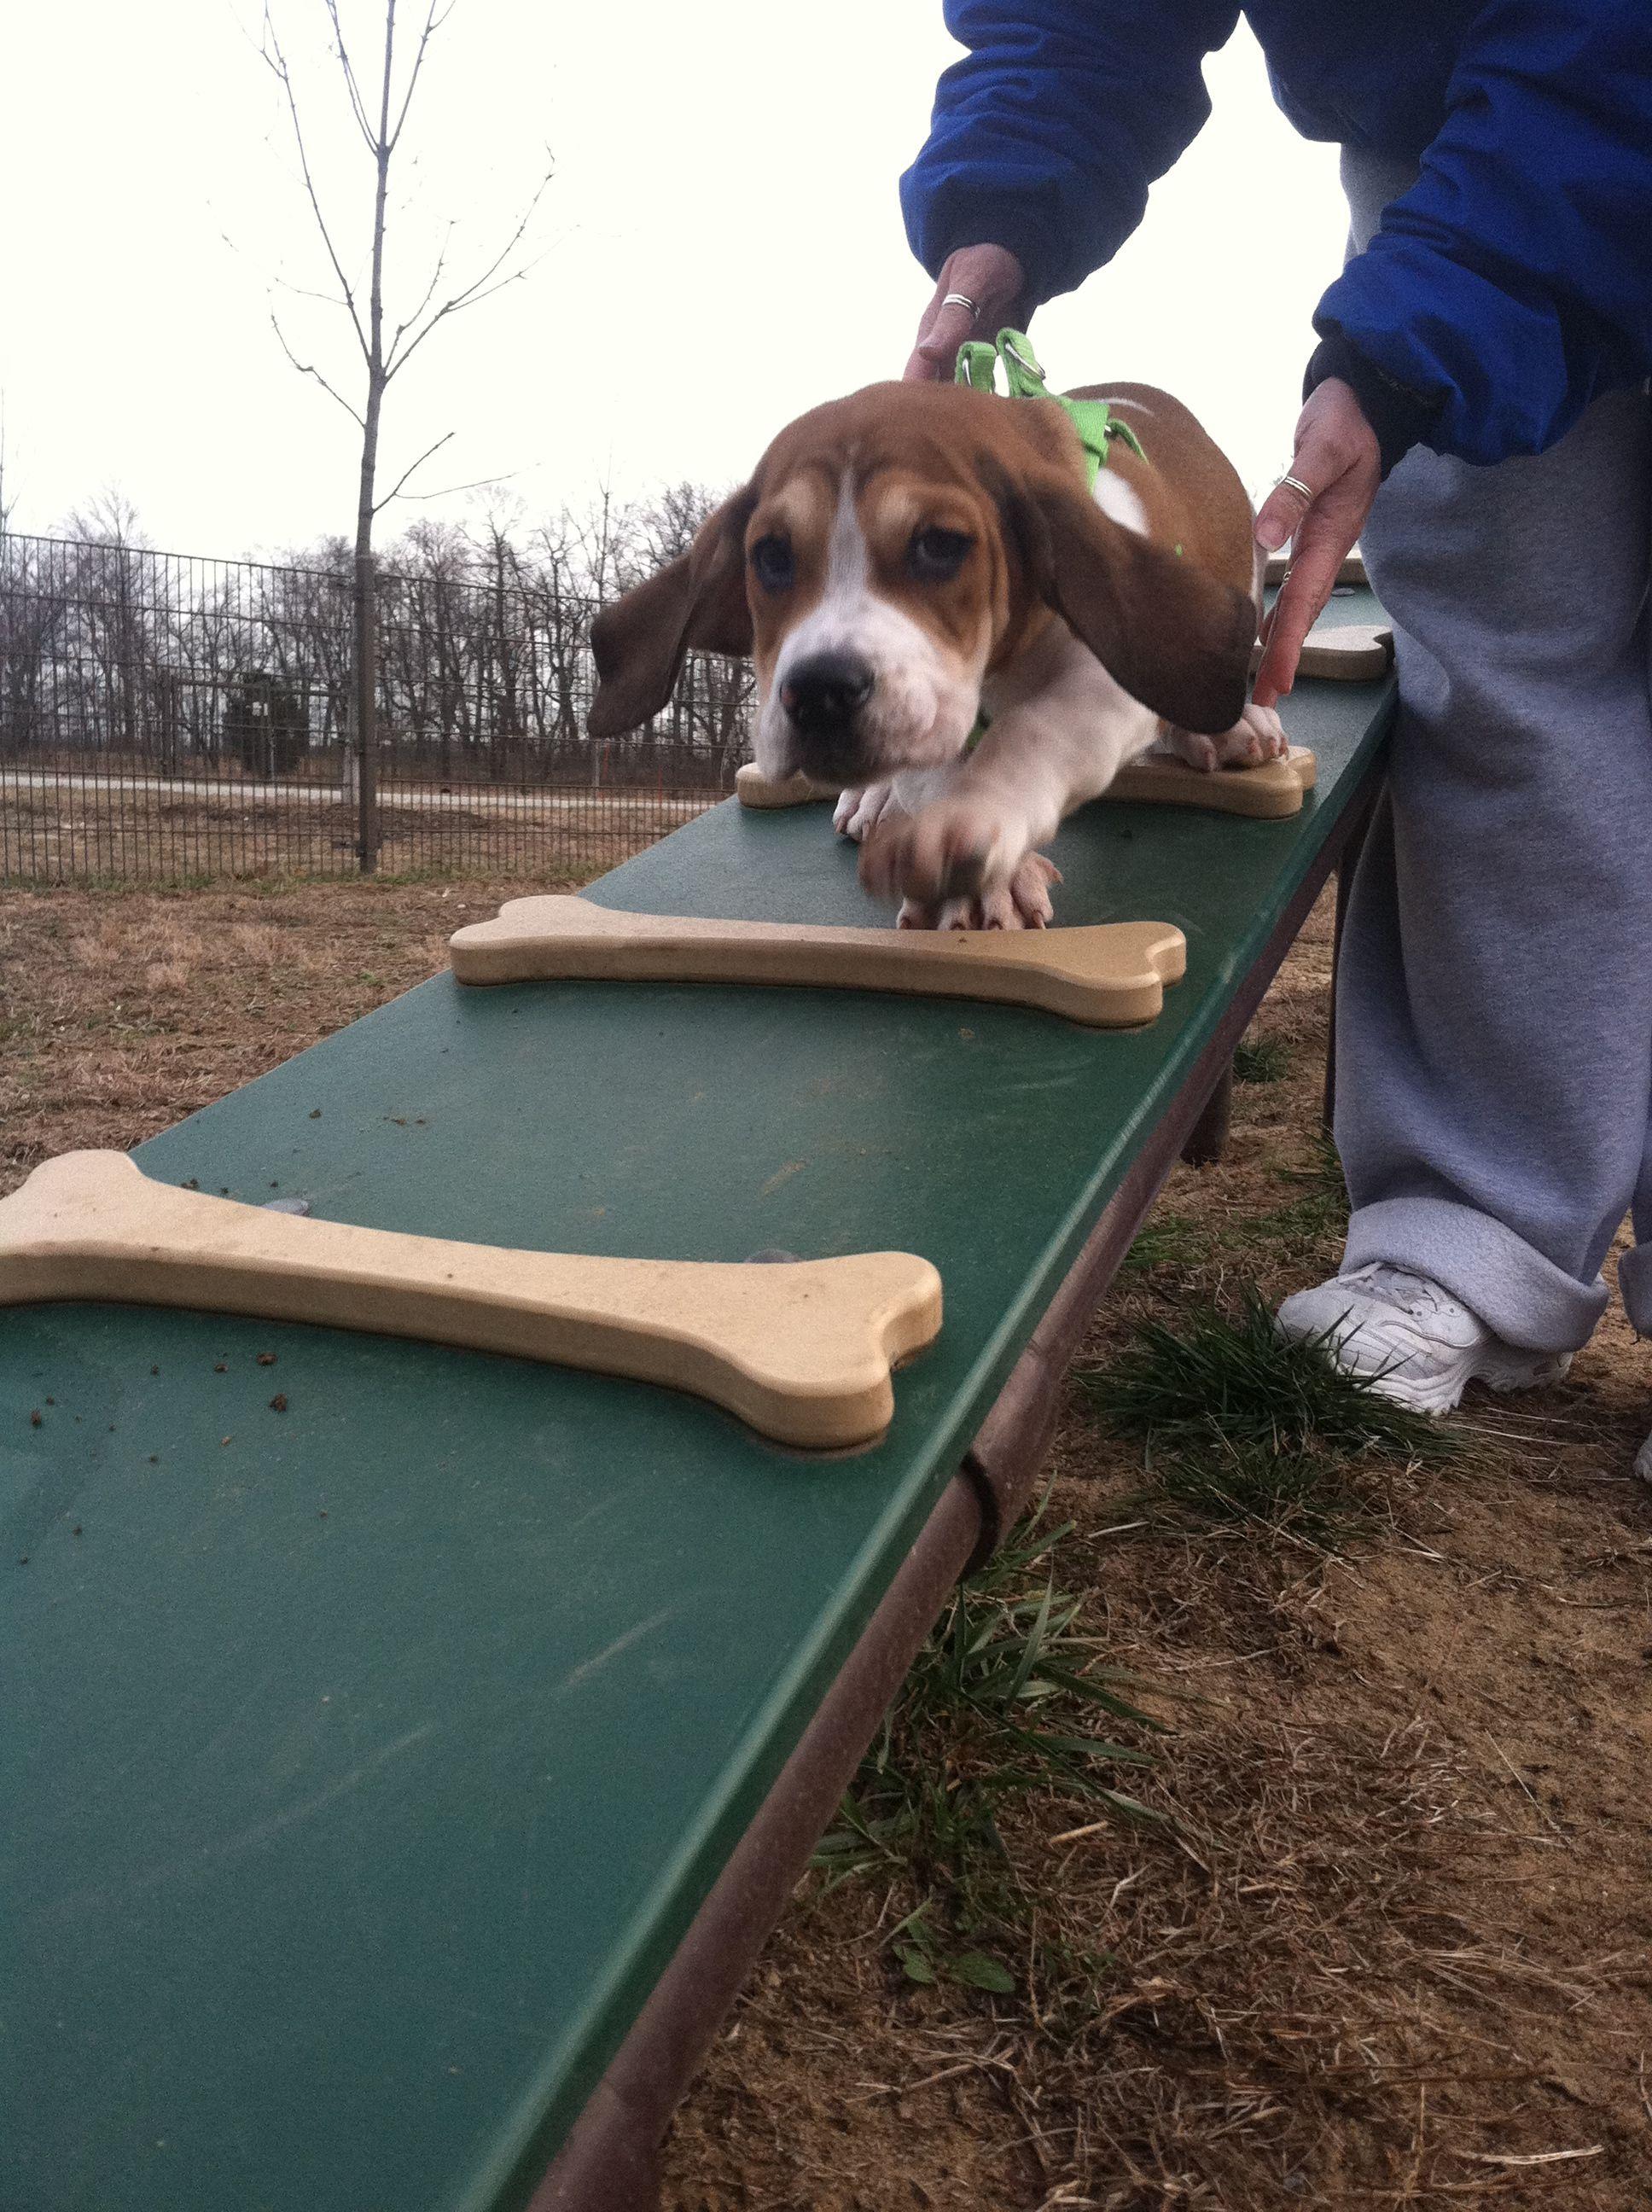 Cat Behavior Dog Park Design Dog Playground Indoor Dog Park